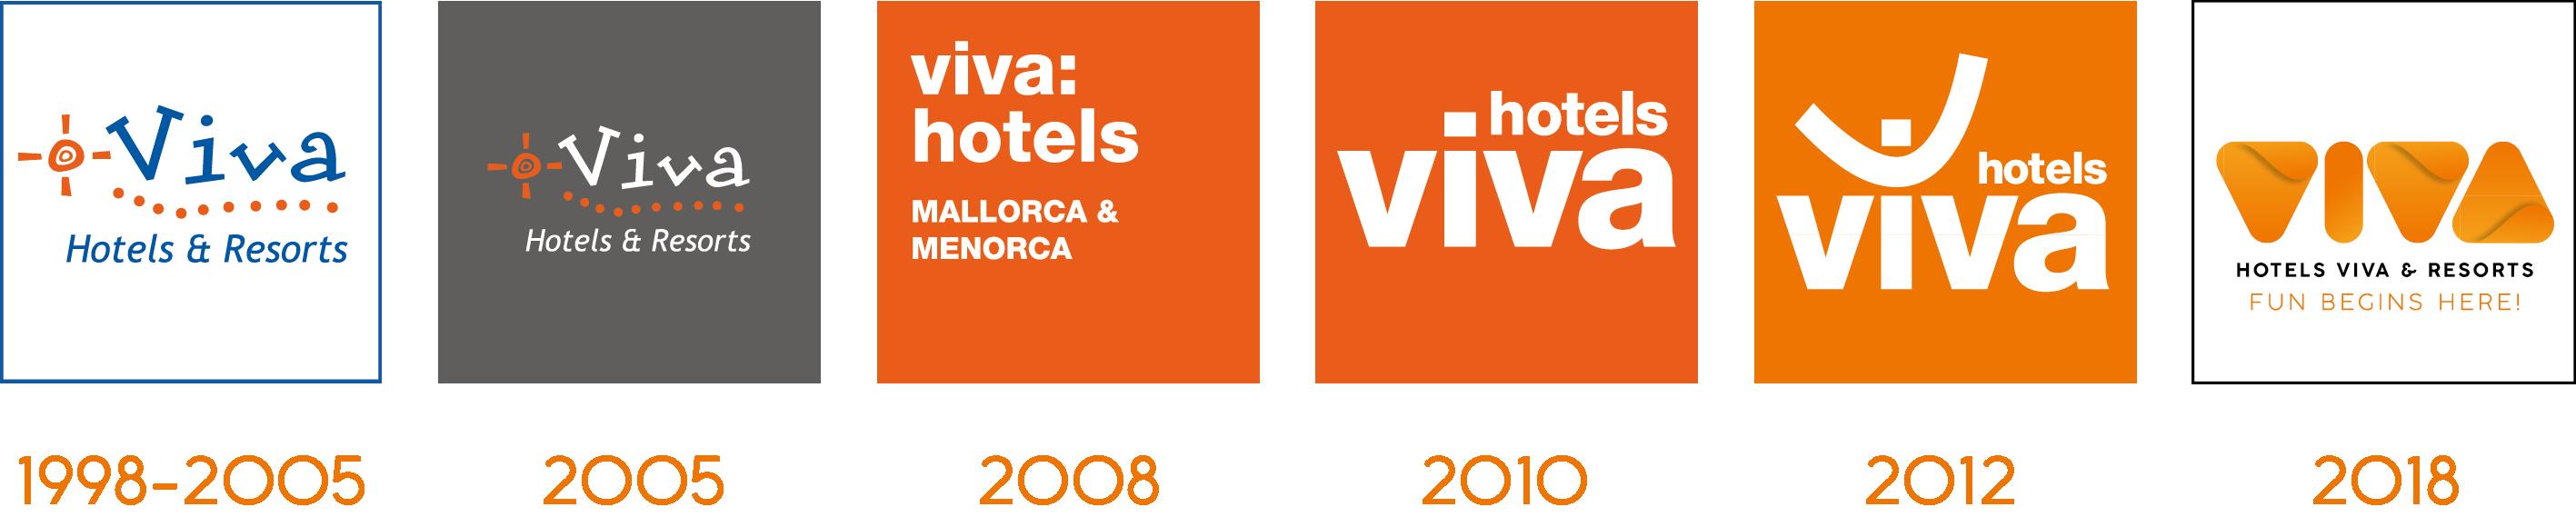 Historia aniversario VIVA.png